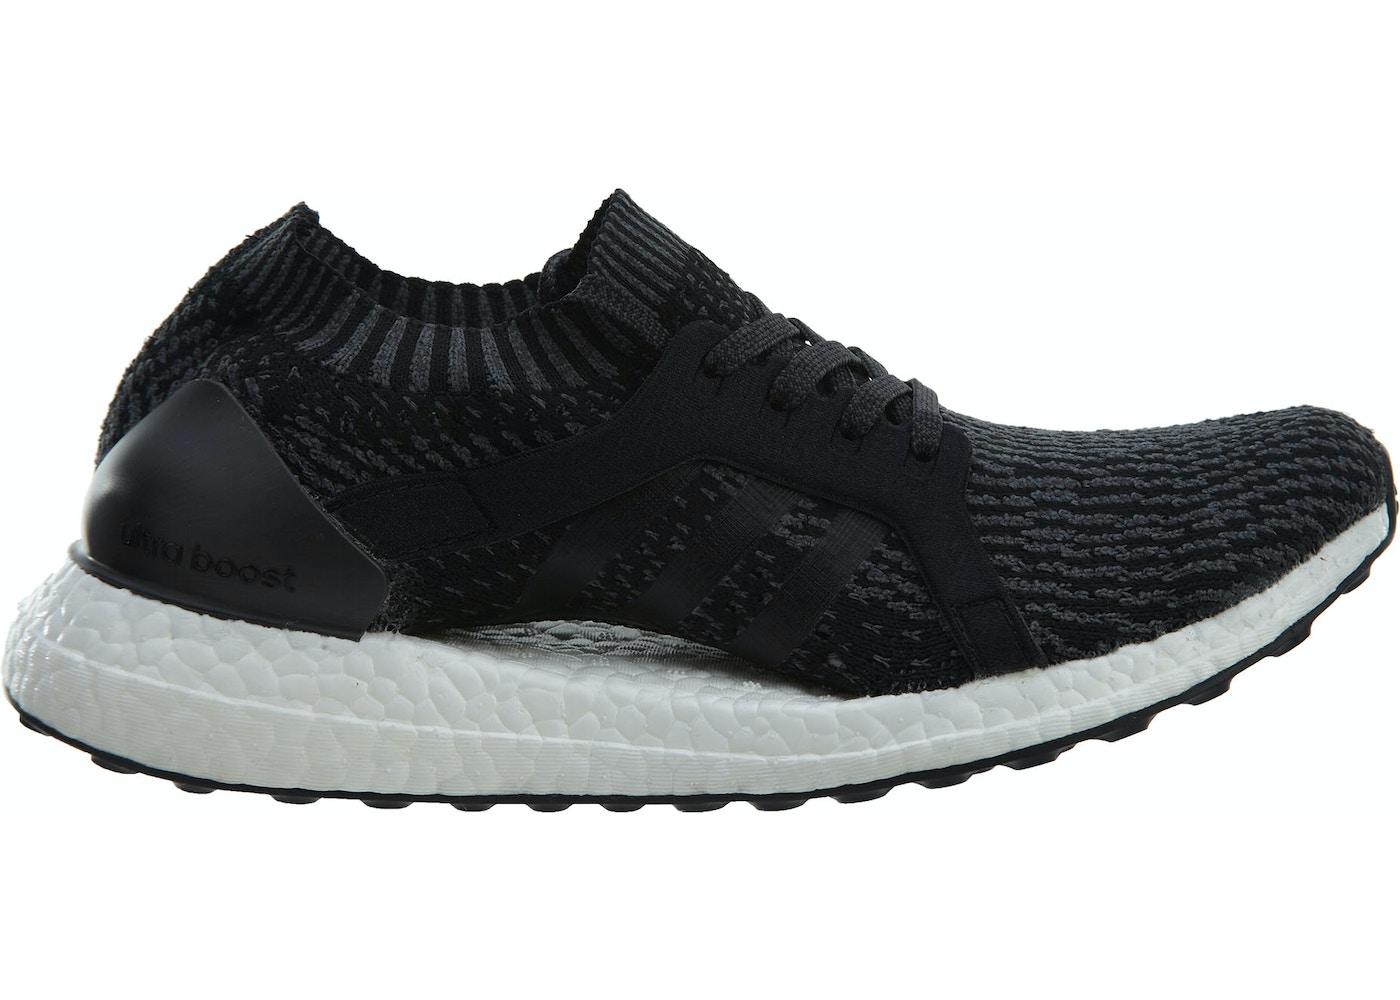 big sale 498d4 86aa8 adidas Ultraboost X Black Dark Grey Heather-Onix (W)